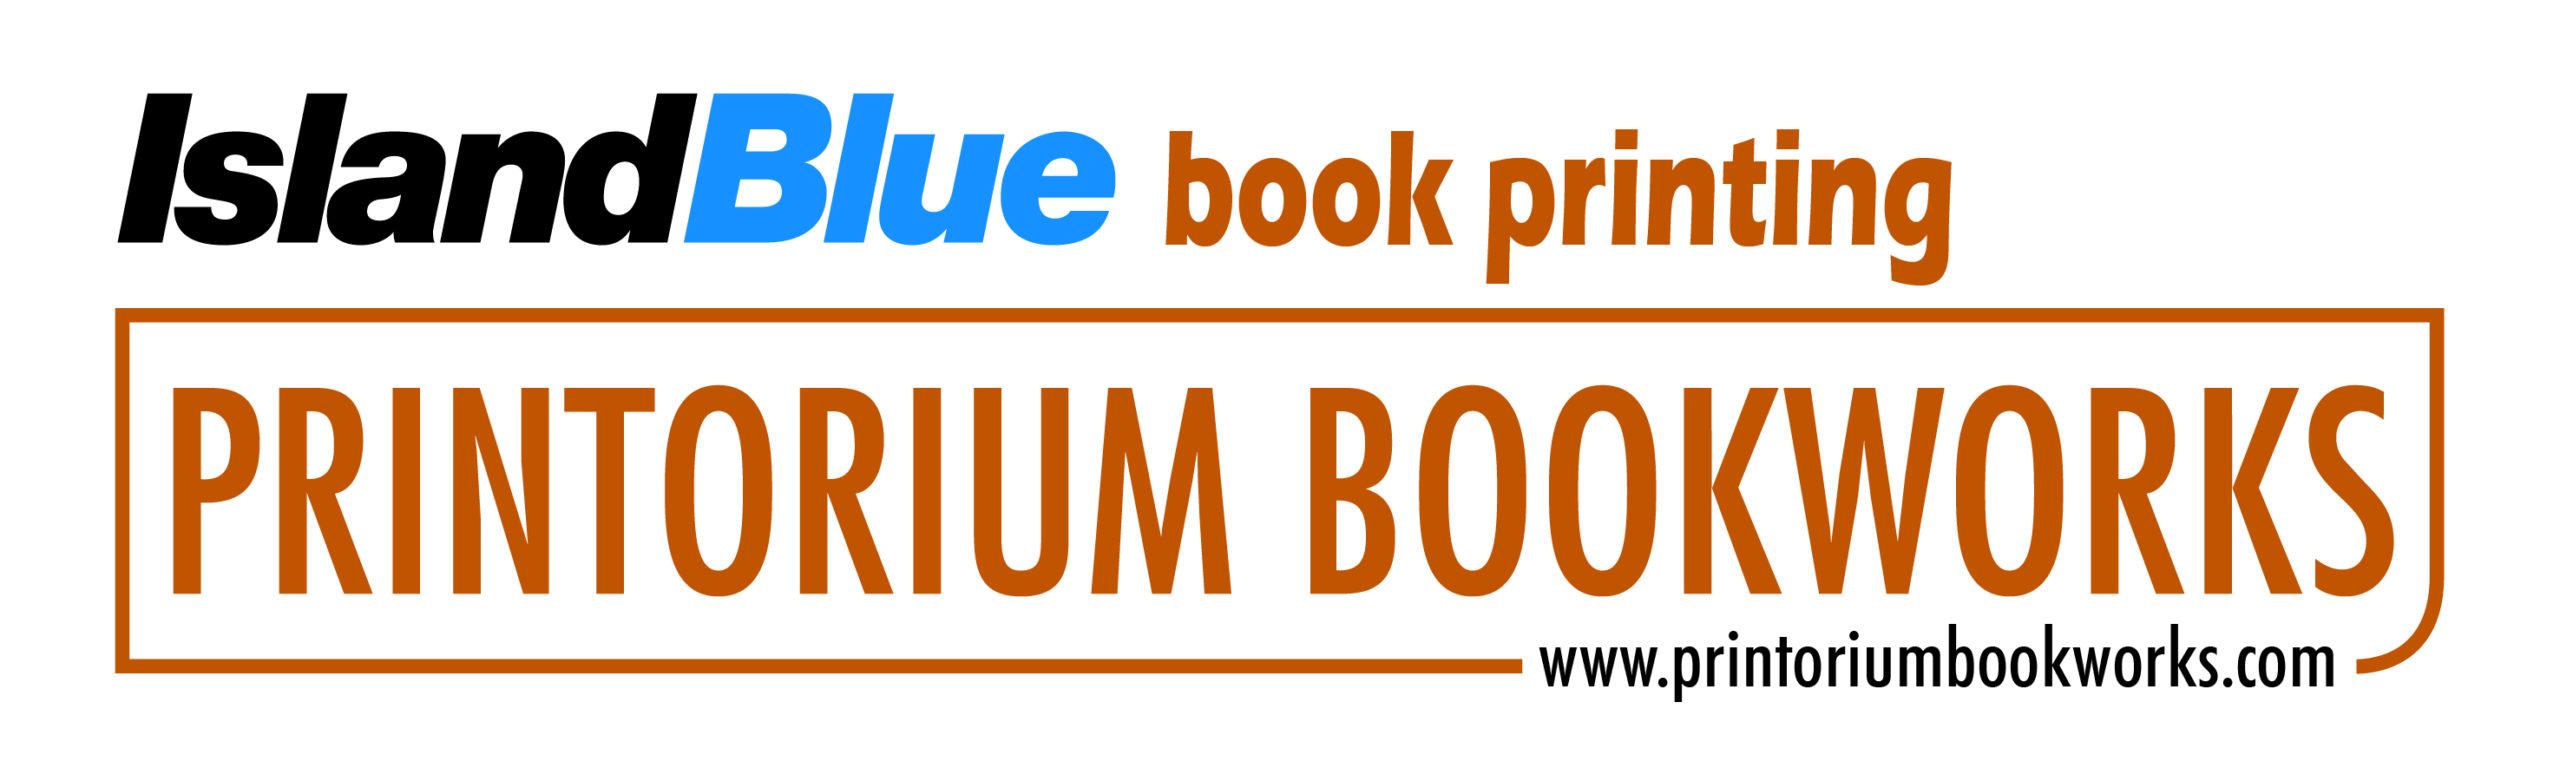 http://printoriumbookworks.islandblue.com